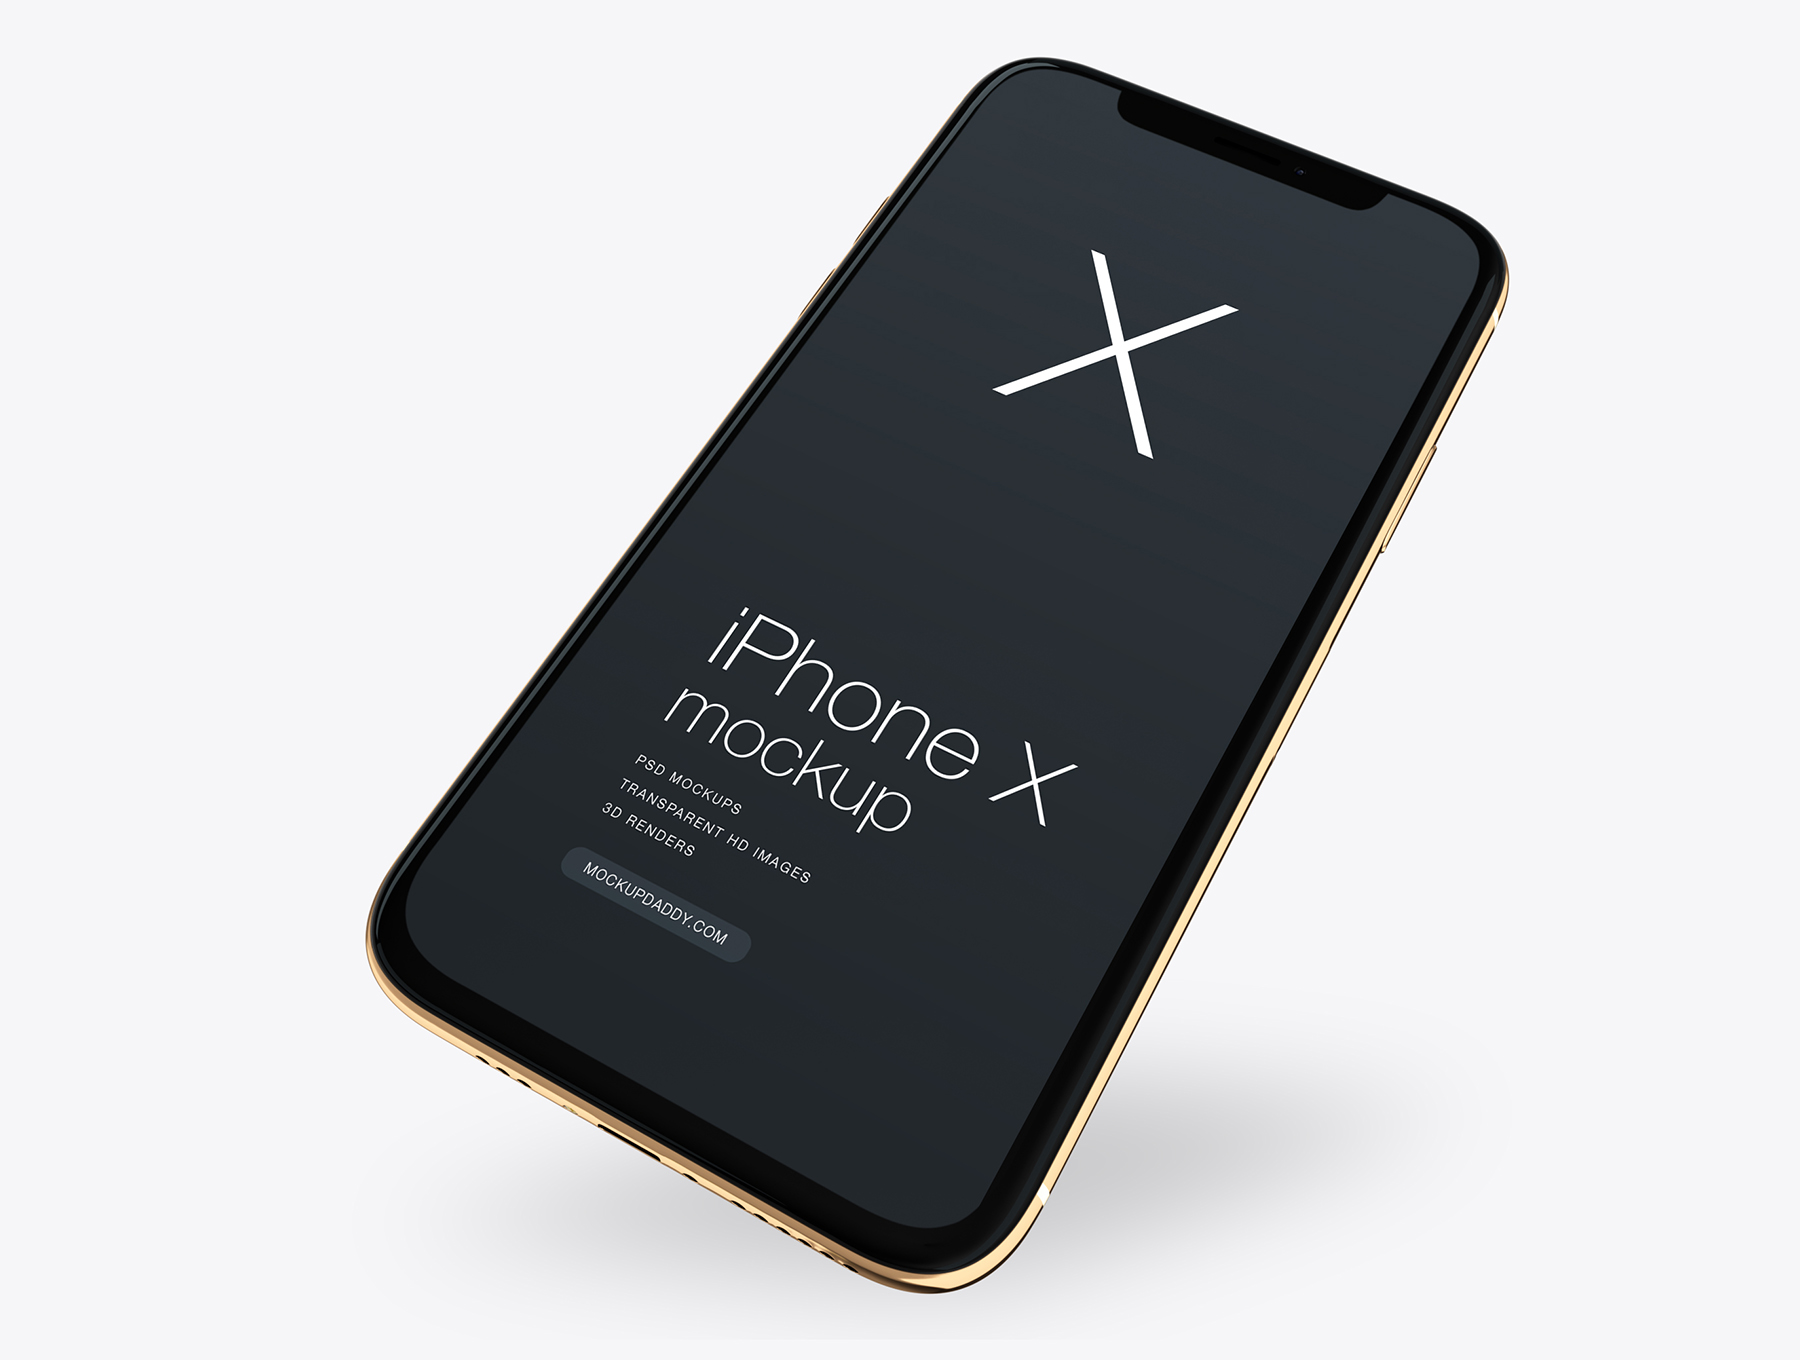 多角度苹果iPhone Xs手机样机Apple Xs Gold Mockup